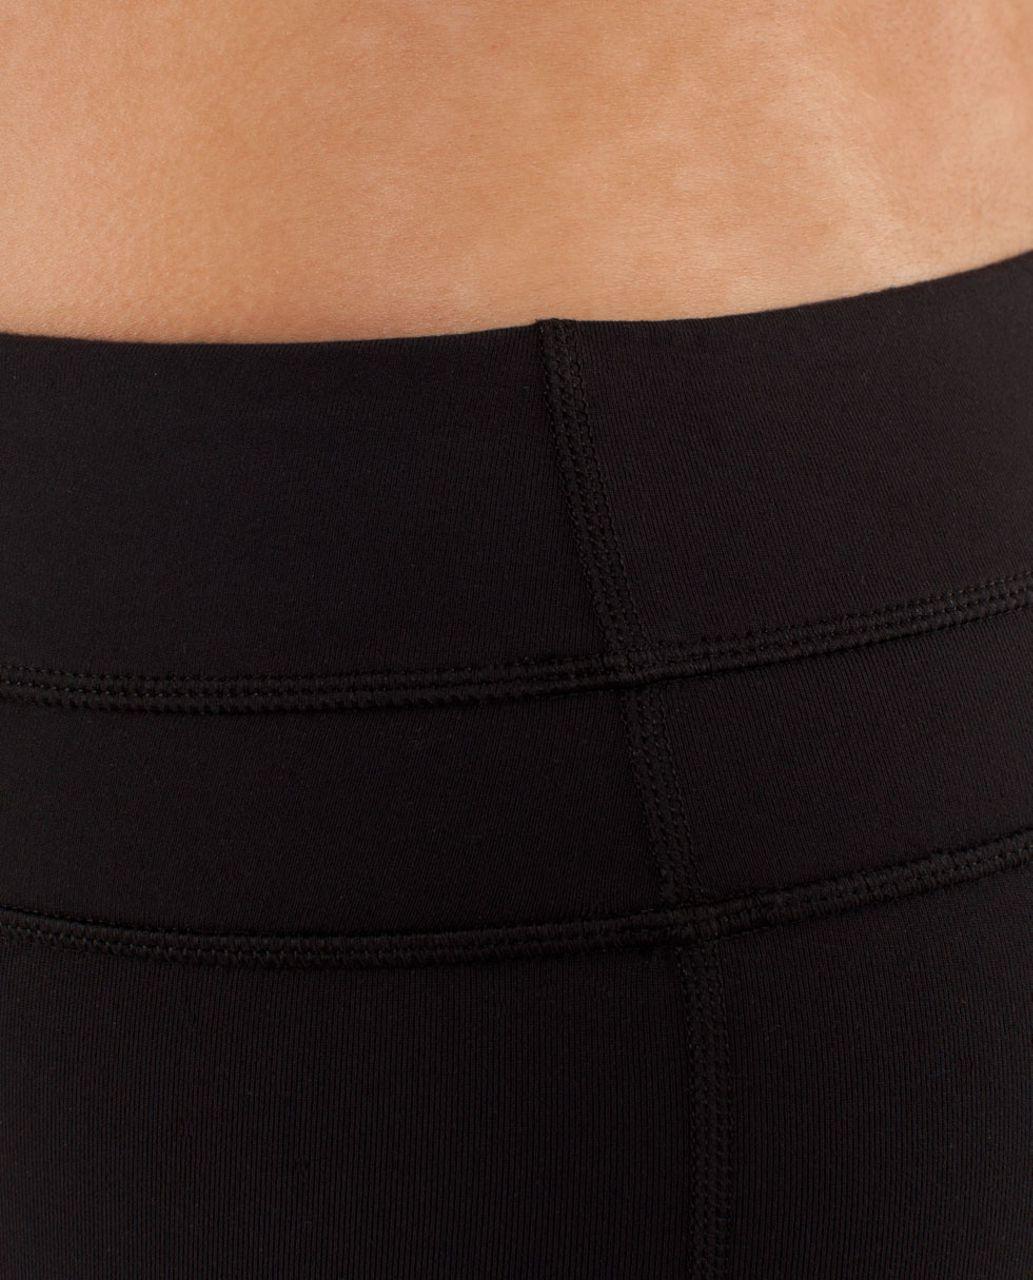 Lululemon Groove Pant *Brushed Slim (Regular) - Black